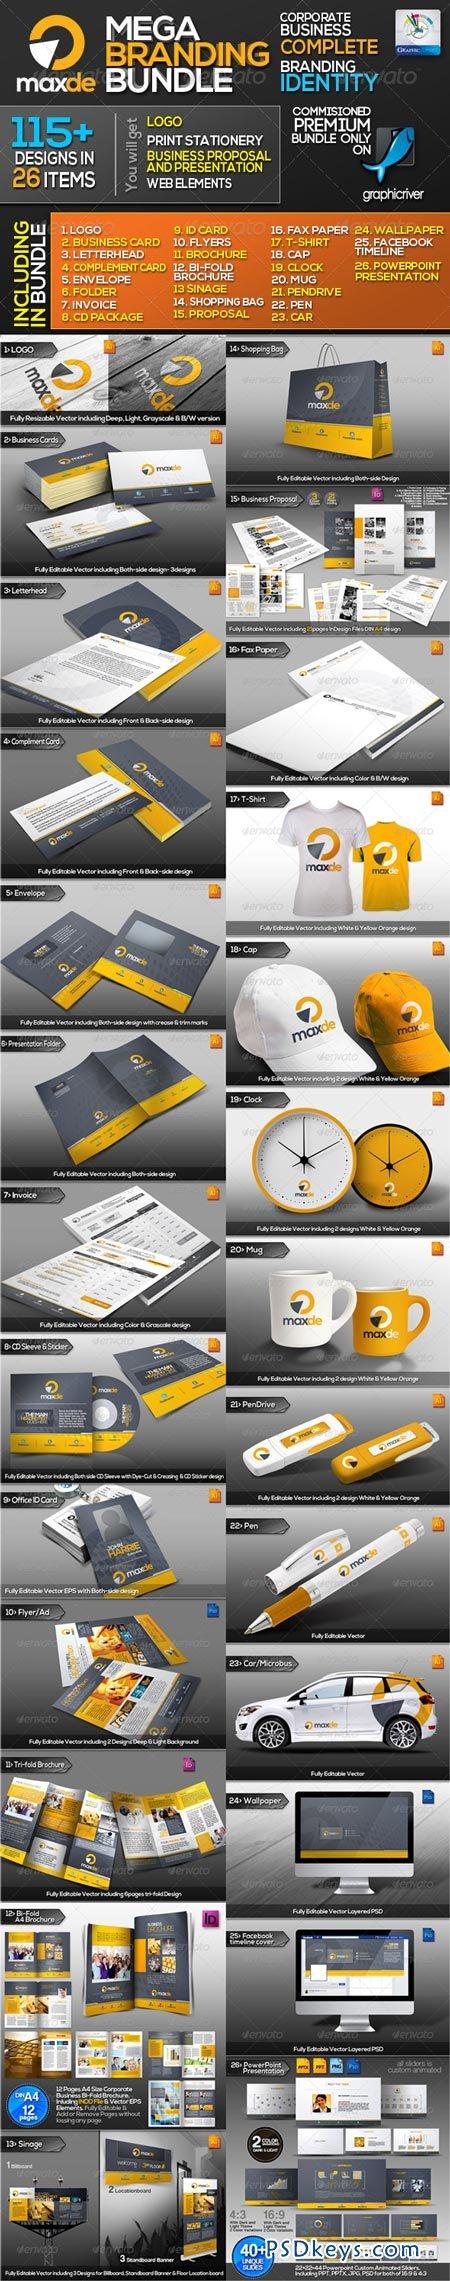 Maxde Corporate Business ID Mega Branding Bundle 3135141